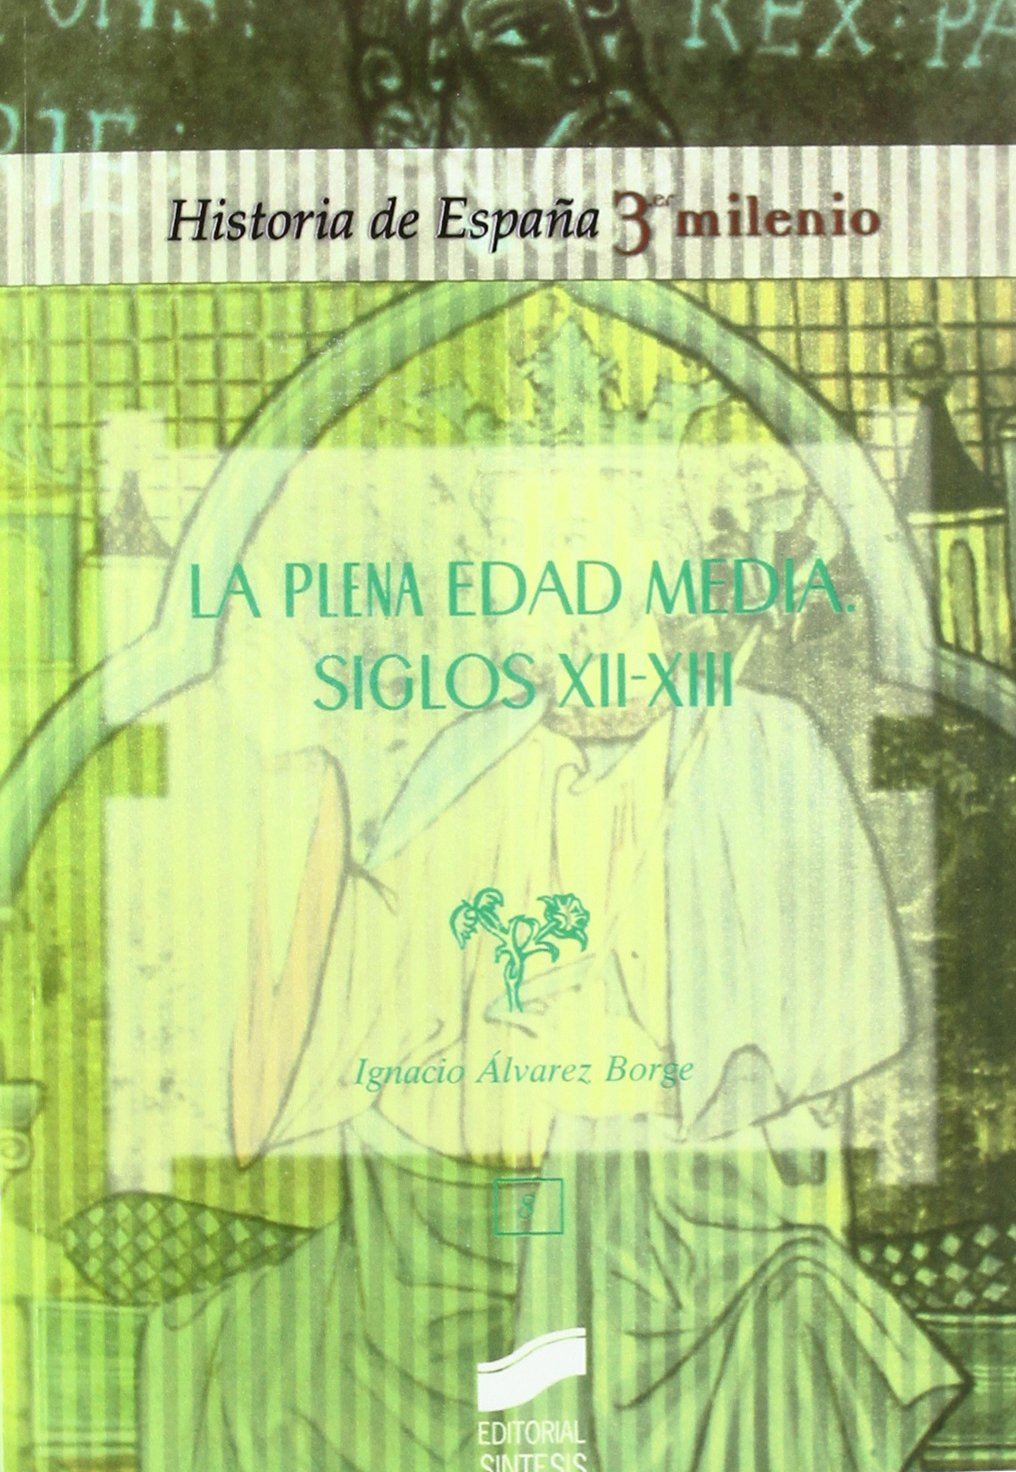 La plena Edad Media: siglos XII-XIII: 1082014 Historia de España, 3er milenio: Amazon.es: Álvarez Borge, Ignacio: Libros